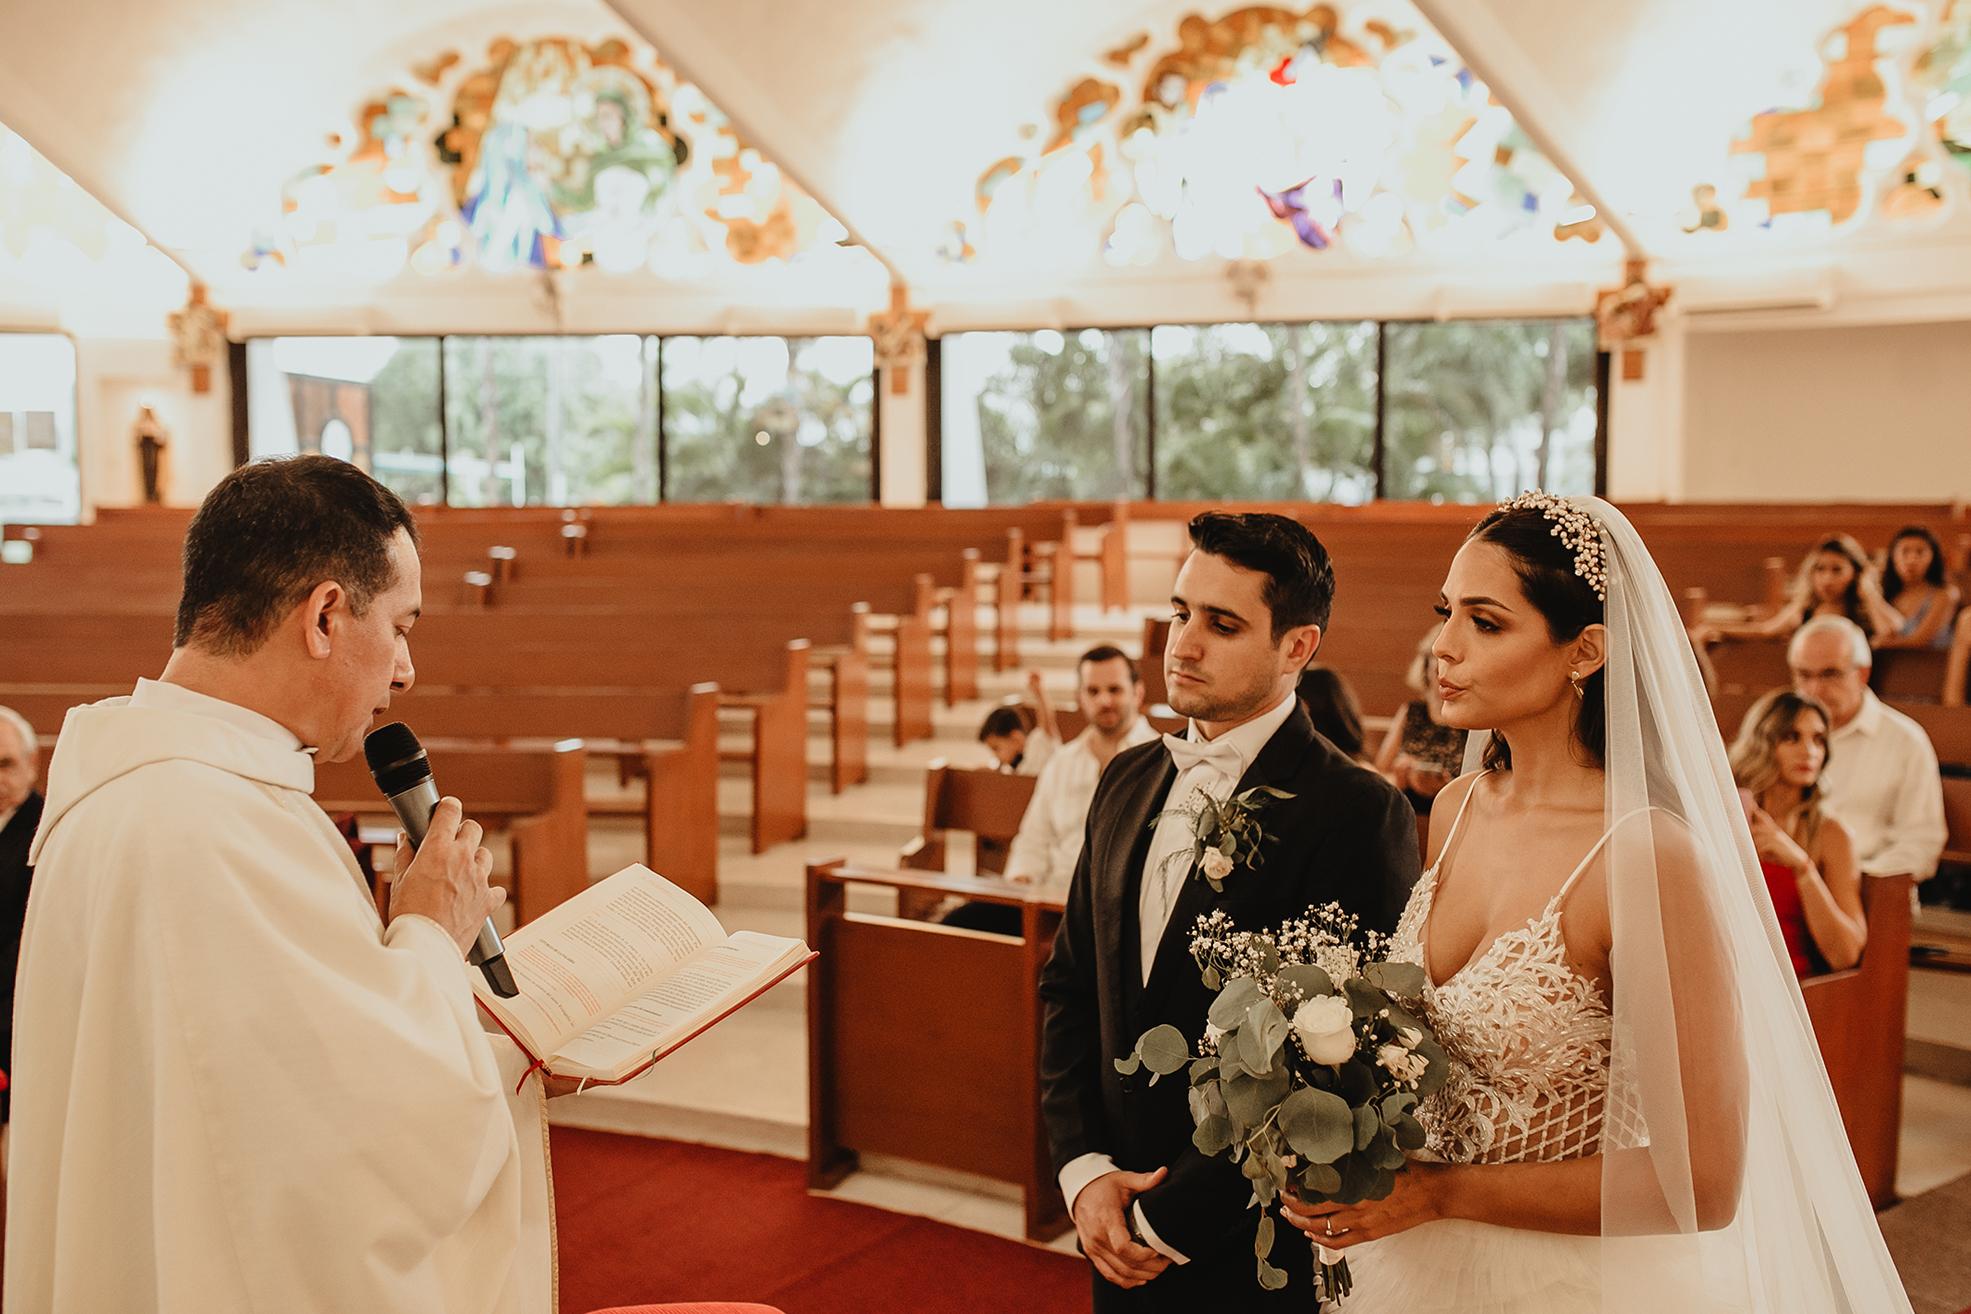 0616R&F__WeddingDestination_Weddingmerida_BodaMexico_FotografoDeBodas_FabrizioSimoneenFotografo.jpg